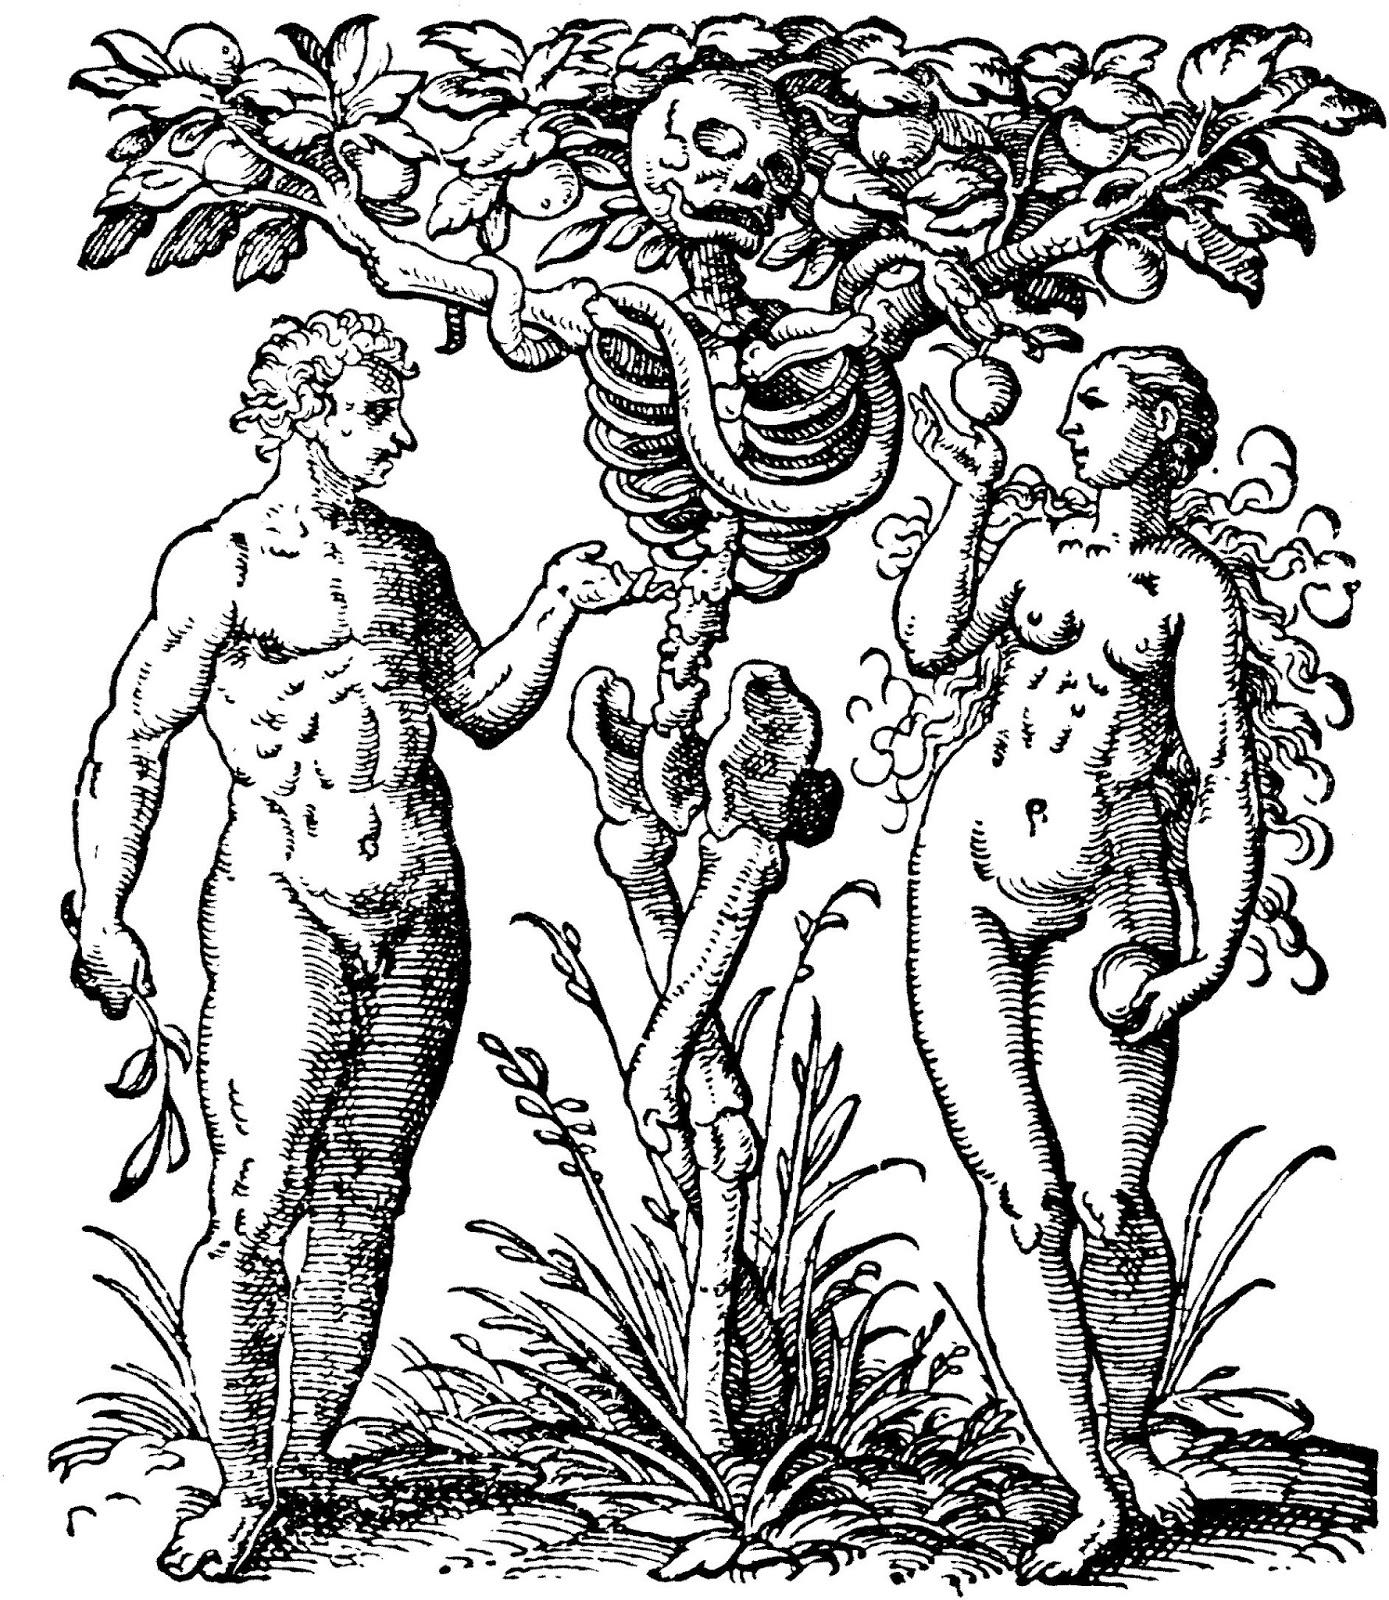 En direct de l 39 intestin gr le le nom des b tes for Tree of knowledge of good and evil tattoo